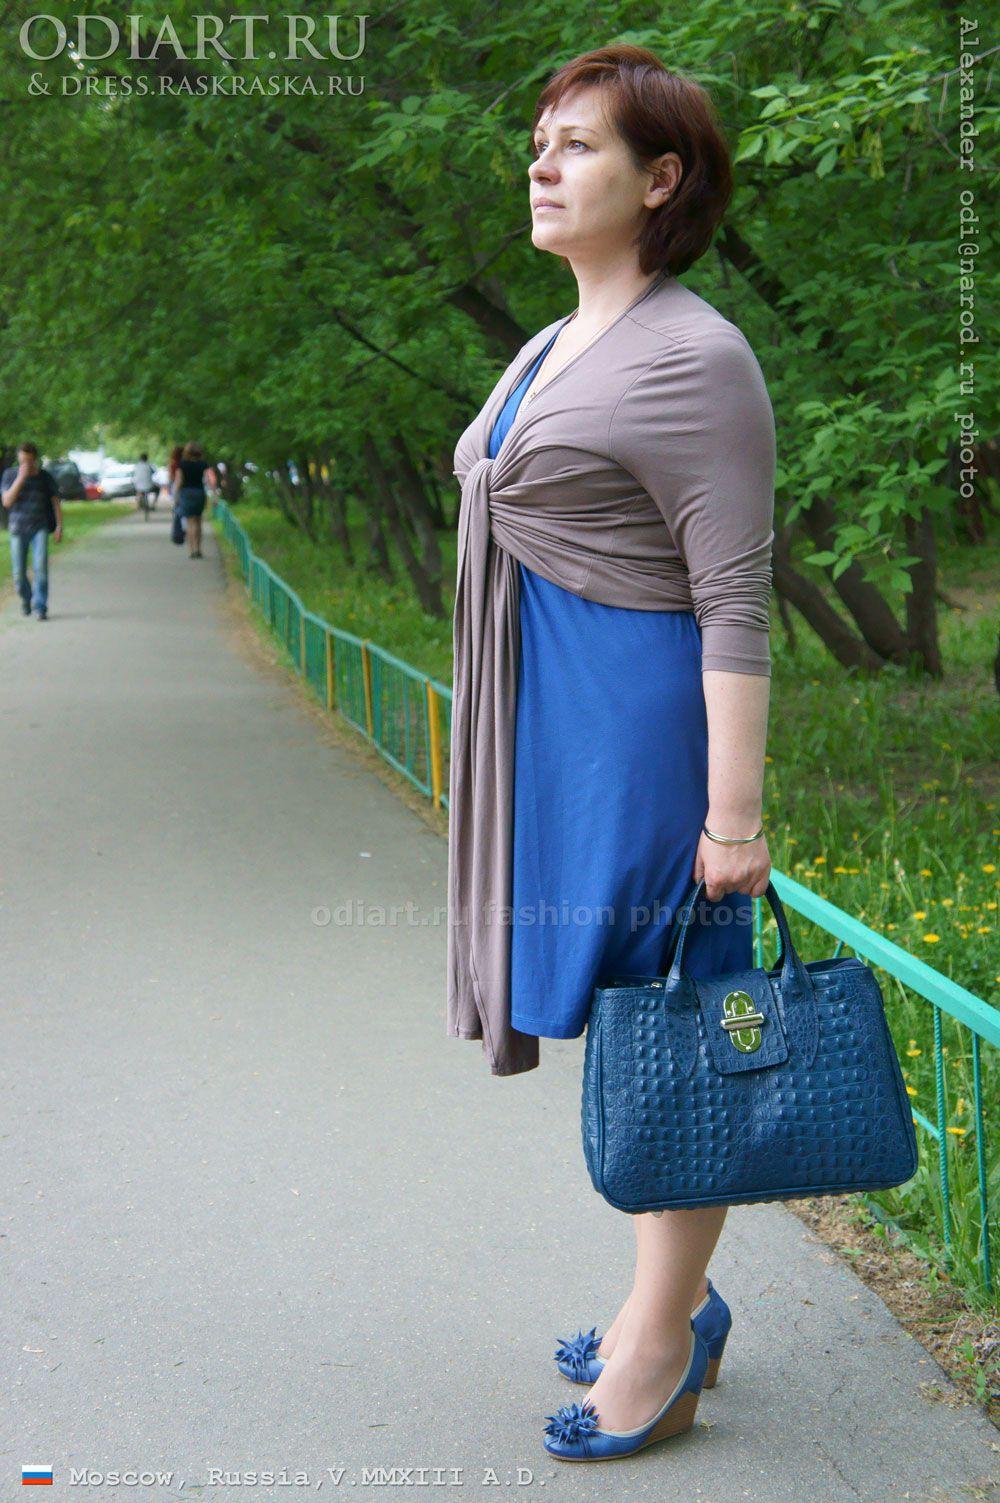 Blue dress. Middle-aged fashion. Blue handbag. Blue shoes Salamandra. Street fashion in Moscow. Russia. Alexander odigif@gmail.com Author's photo.